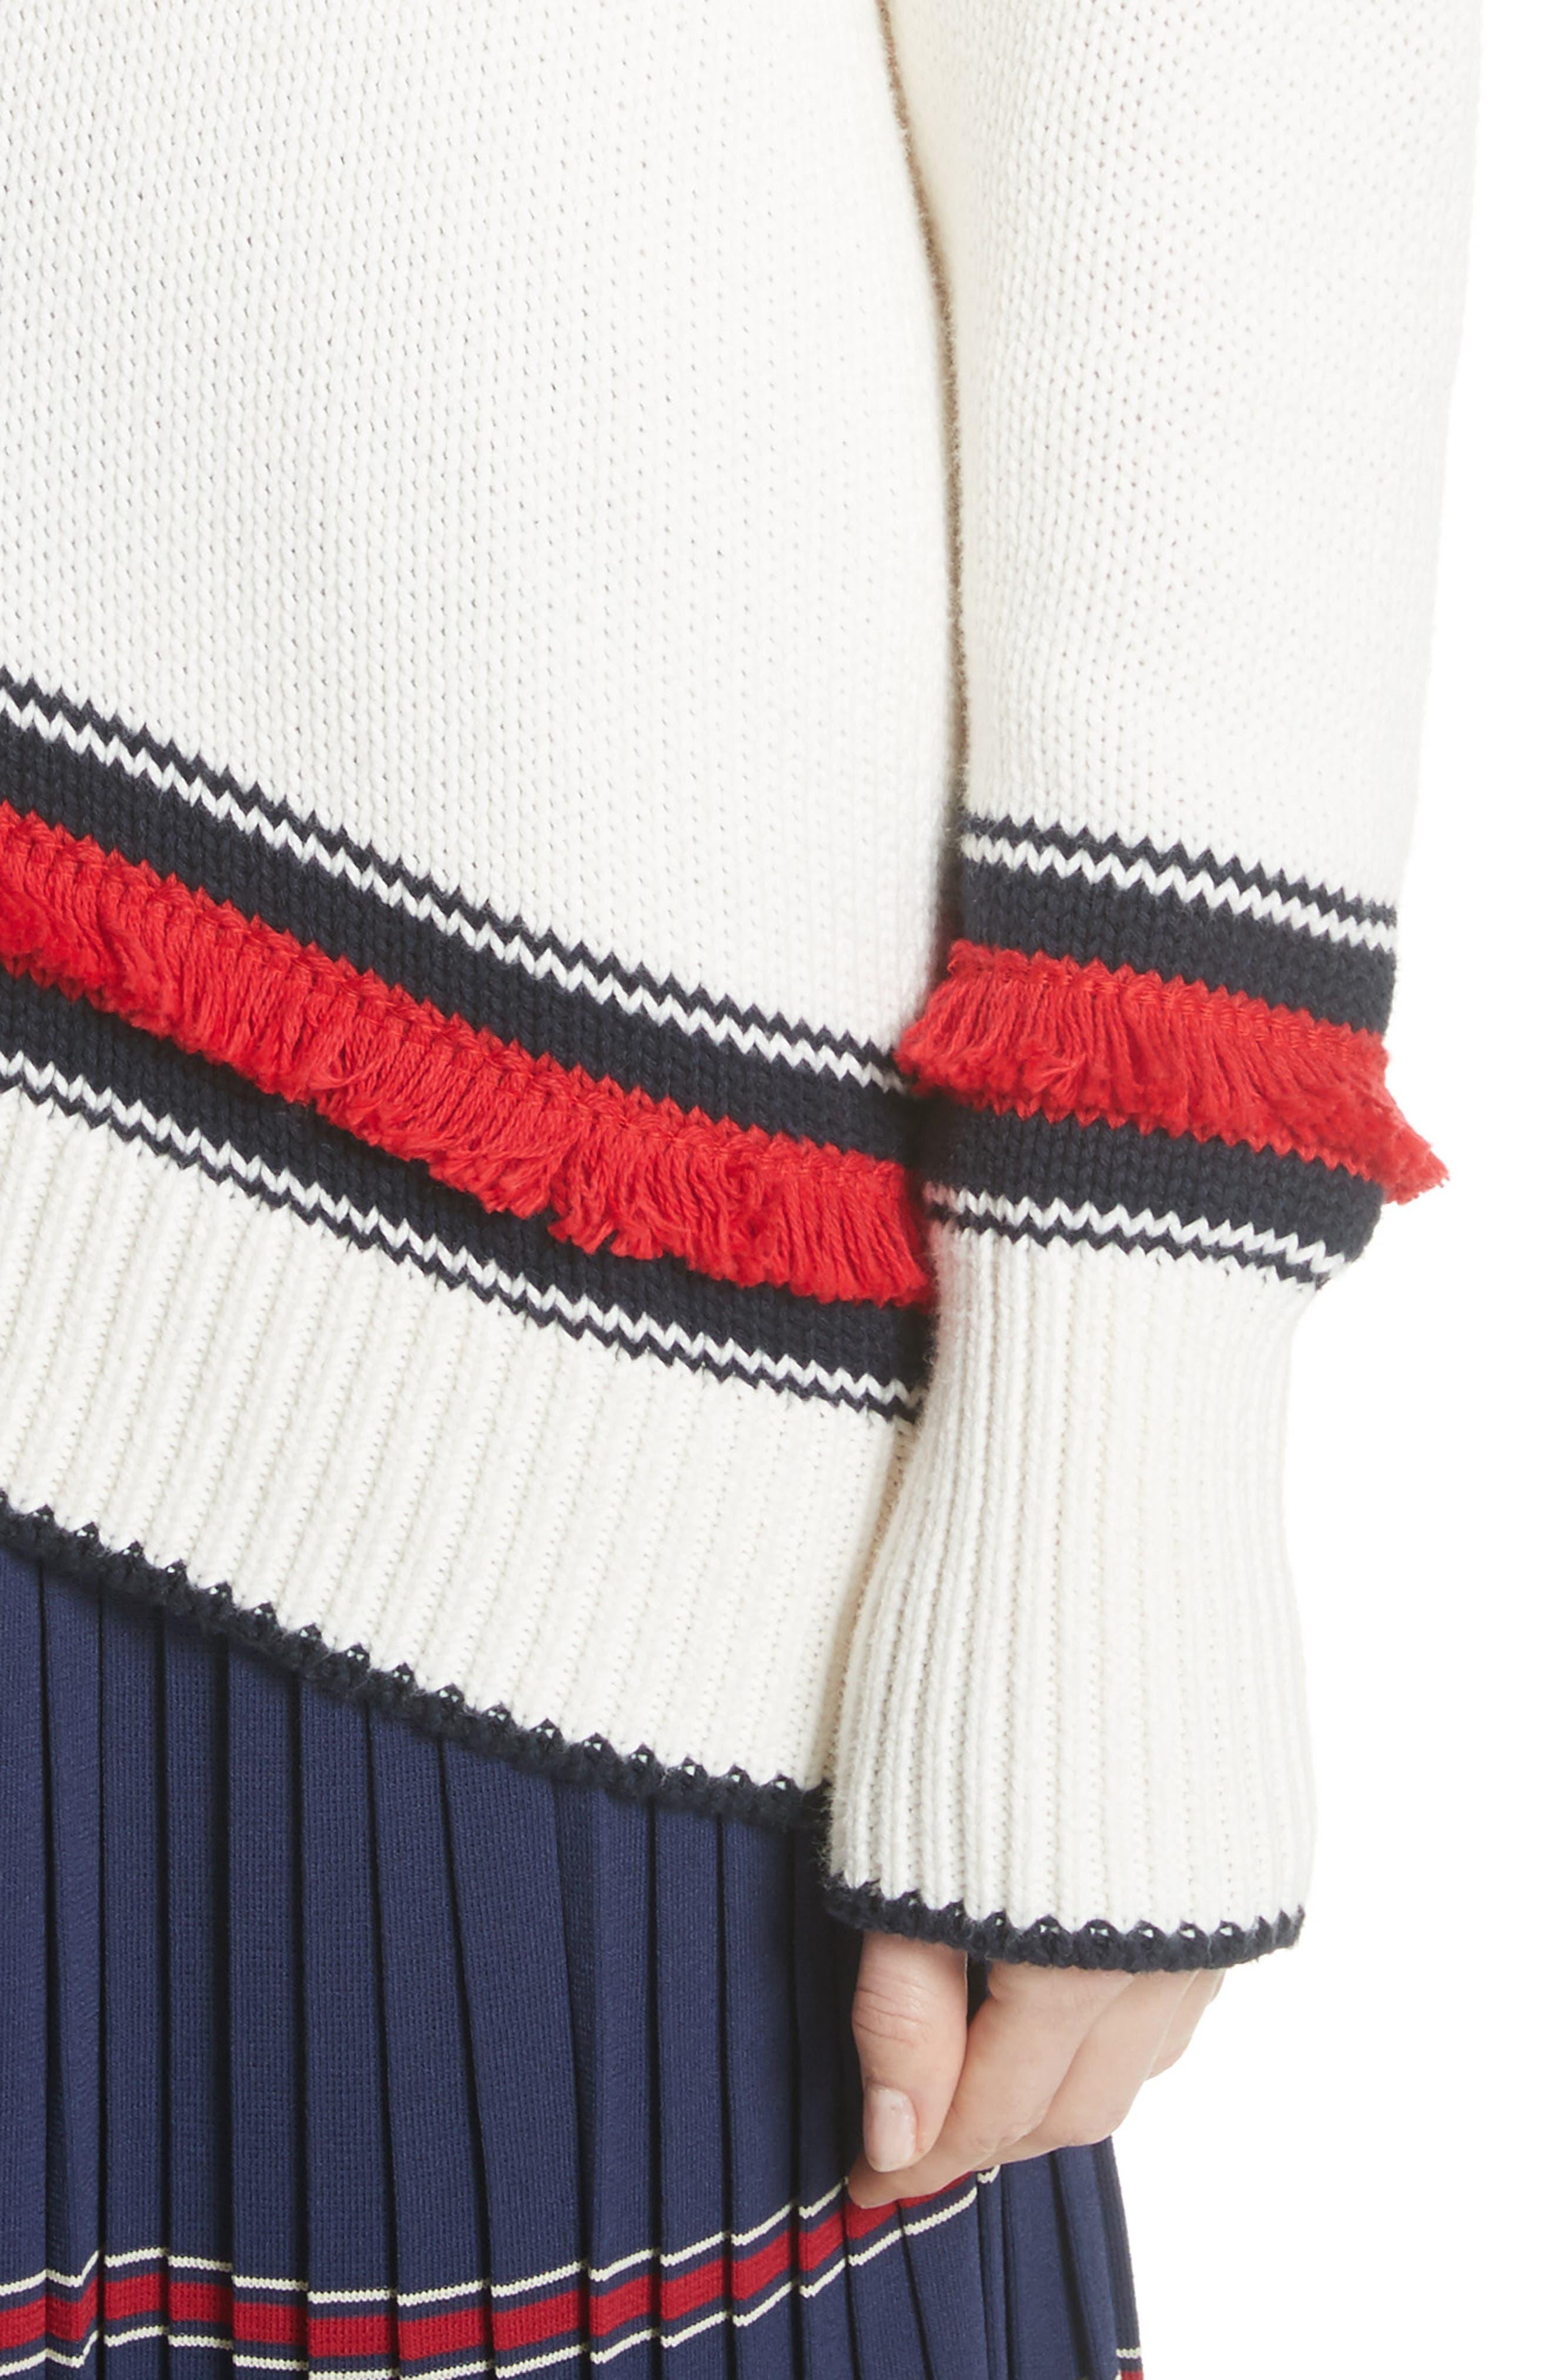 V-Neck Cotton & Cashmere Sweater,                             Alternate thumbnail 4, color,                             900